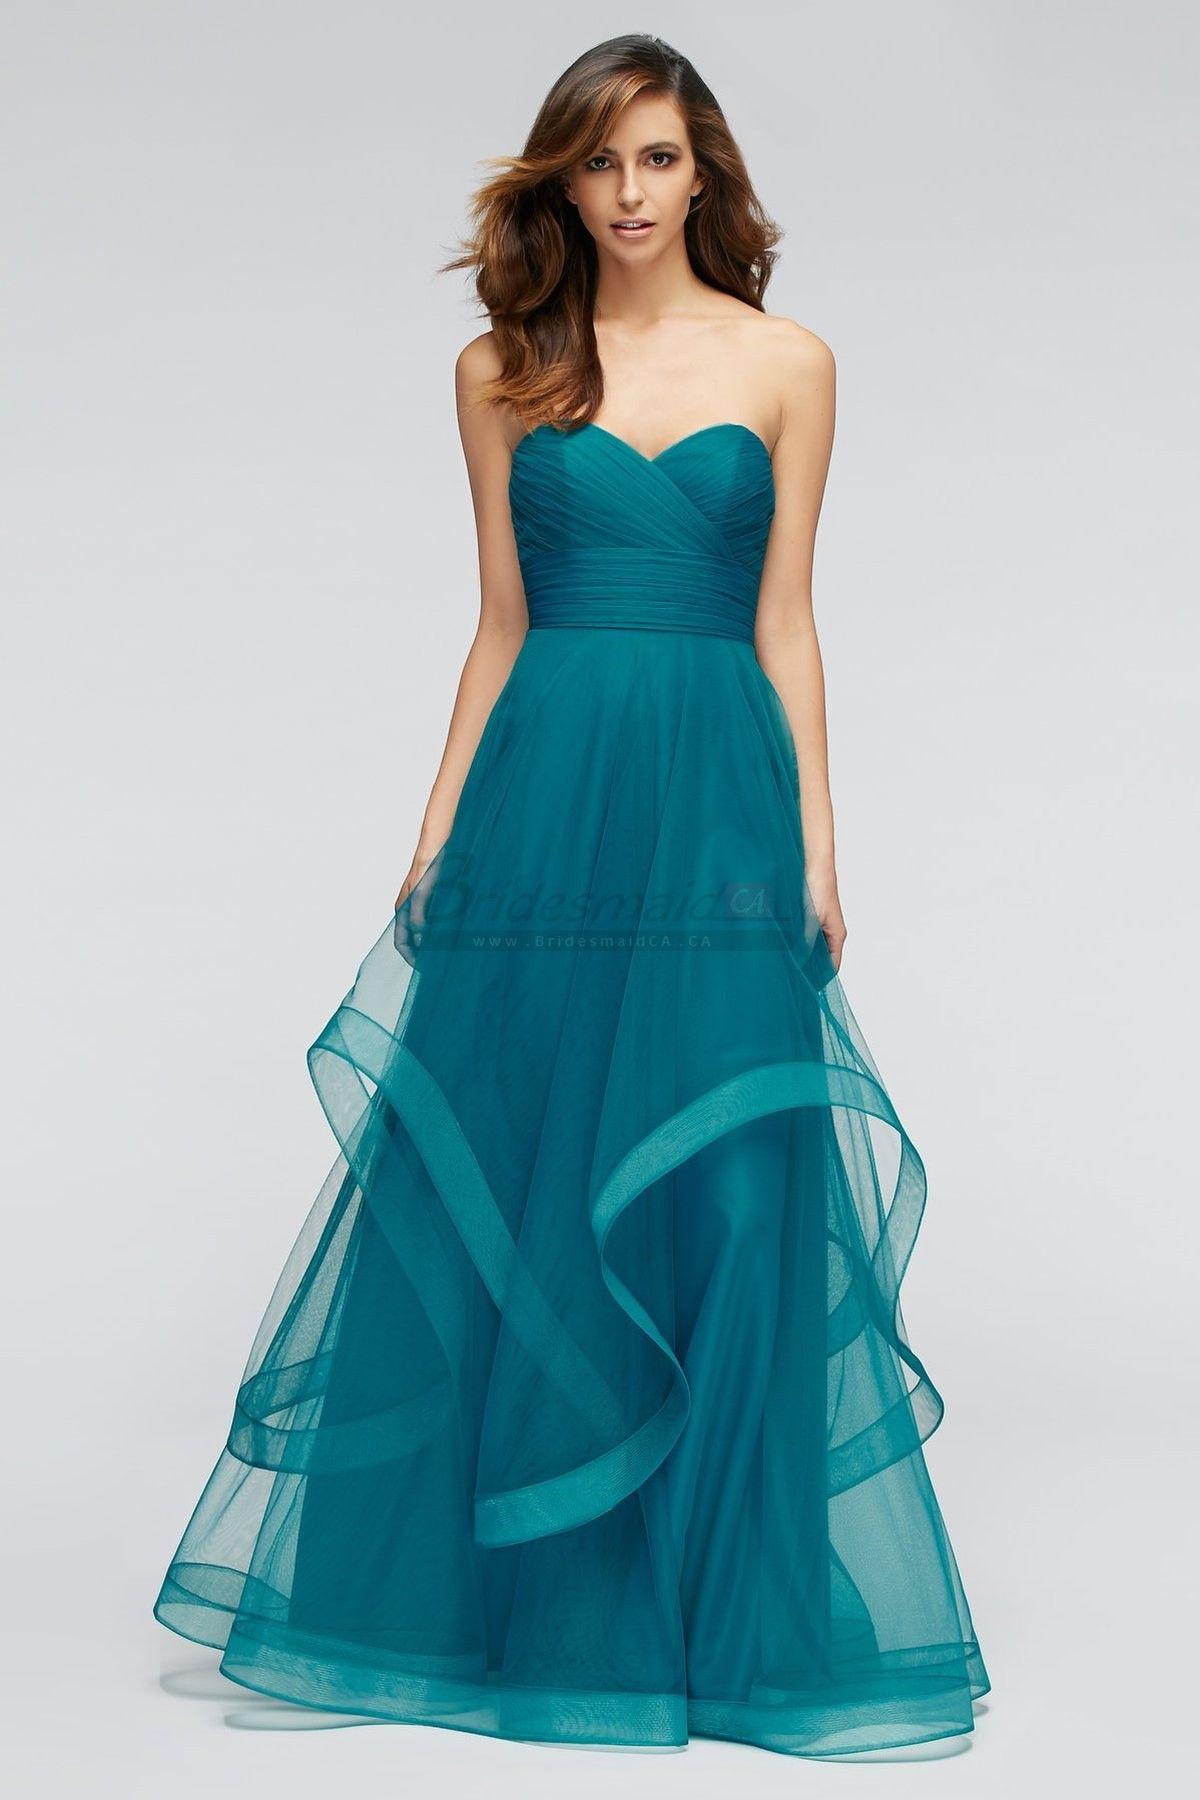 A Line Long Sweetheart Neckline Blue Teal Greens Bridesmaid Dress BD ...